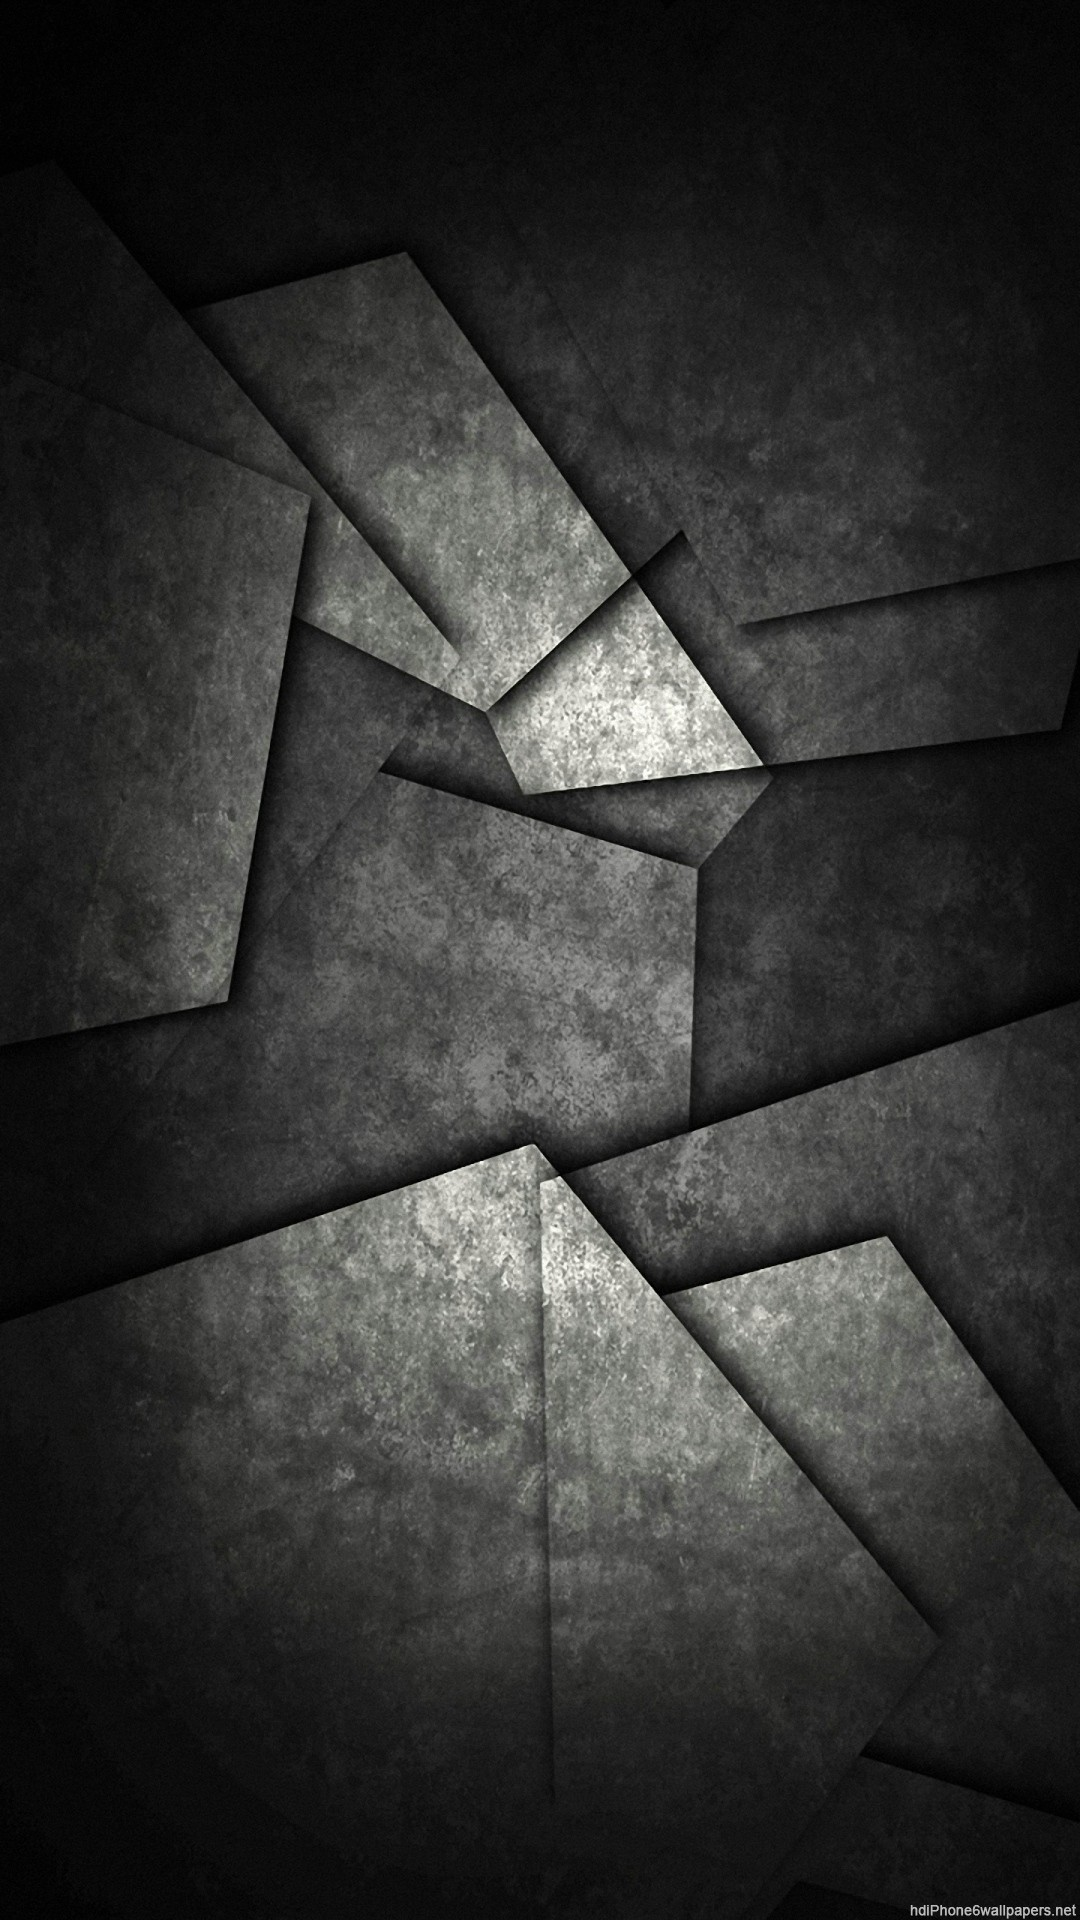 Hd vertical wallpaper 79 images - Black wallpaper iphone 6 hd ...